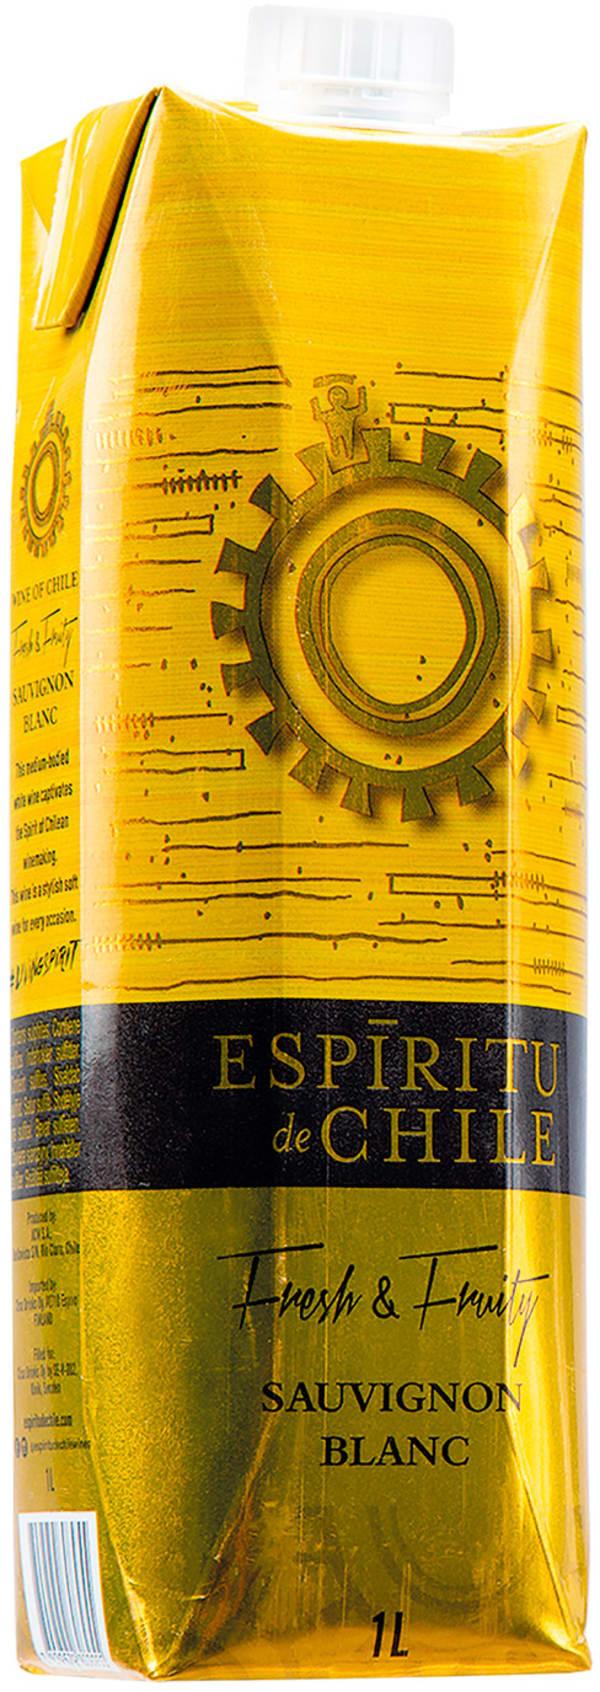 Espiritu de Chile Fresh & Fruity Sauvignon Blanc carton package